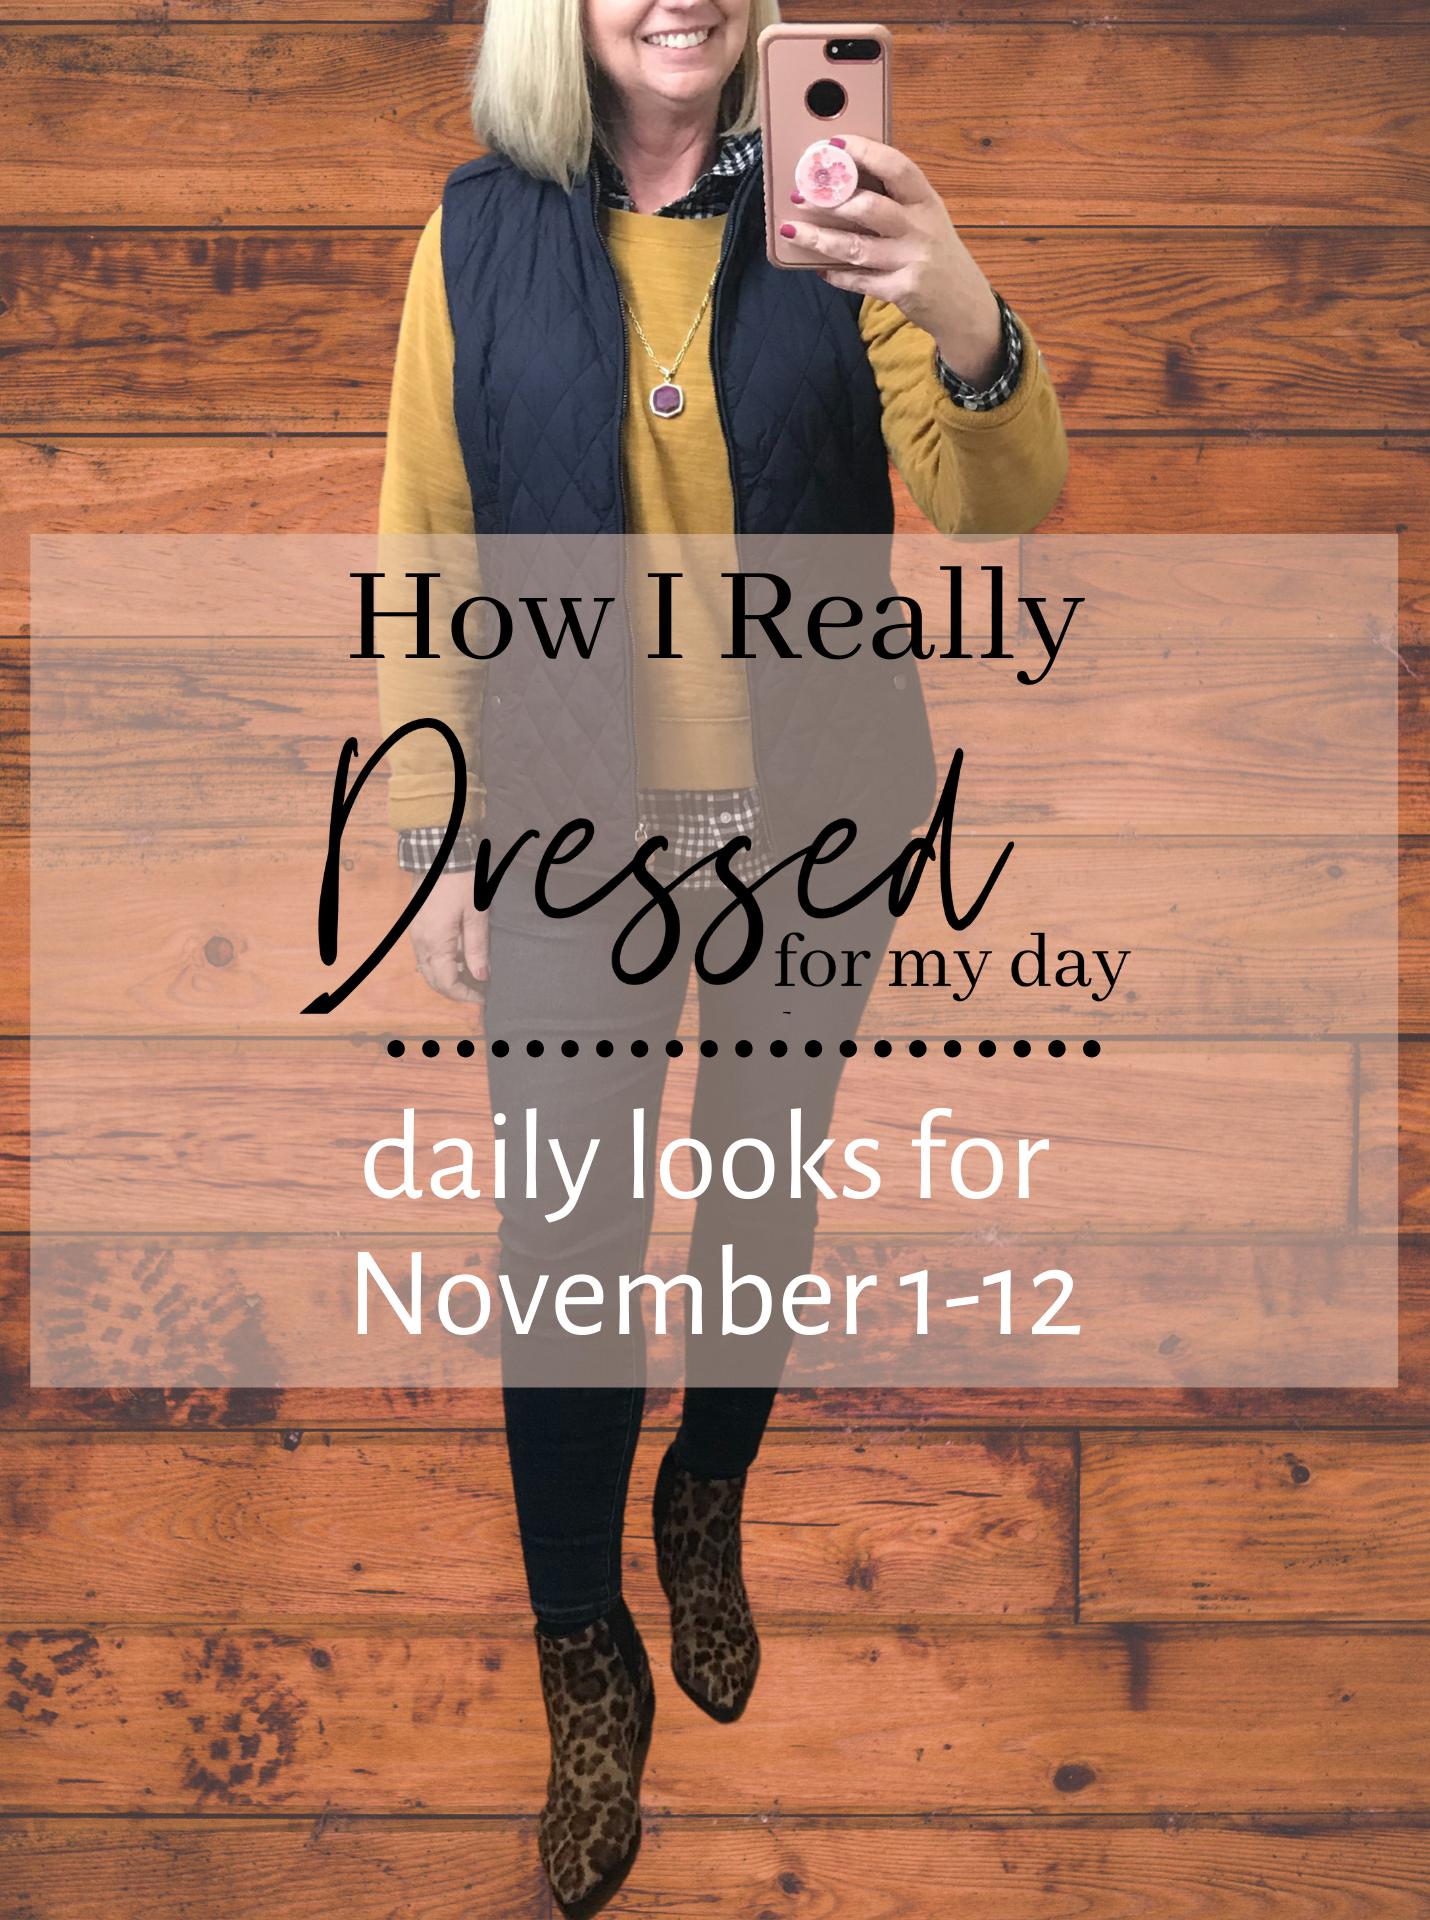 How I Really Dressed 11-13-2020